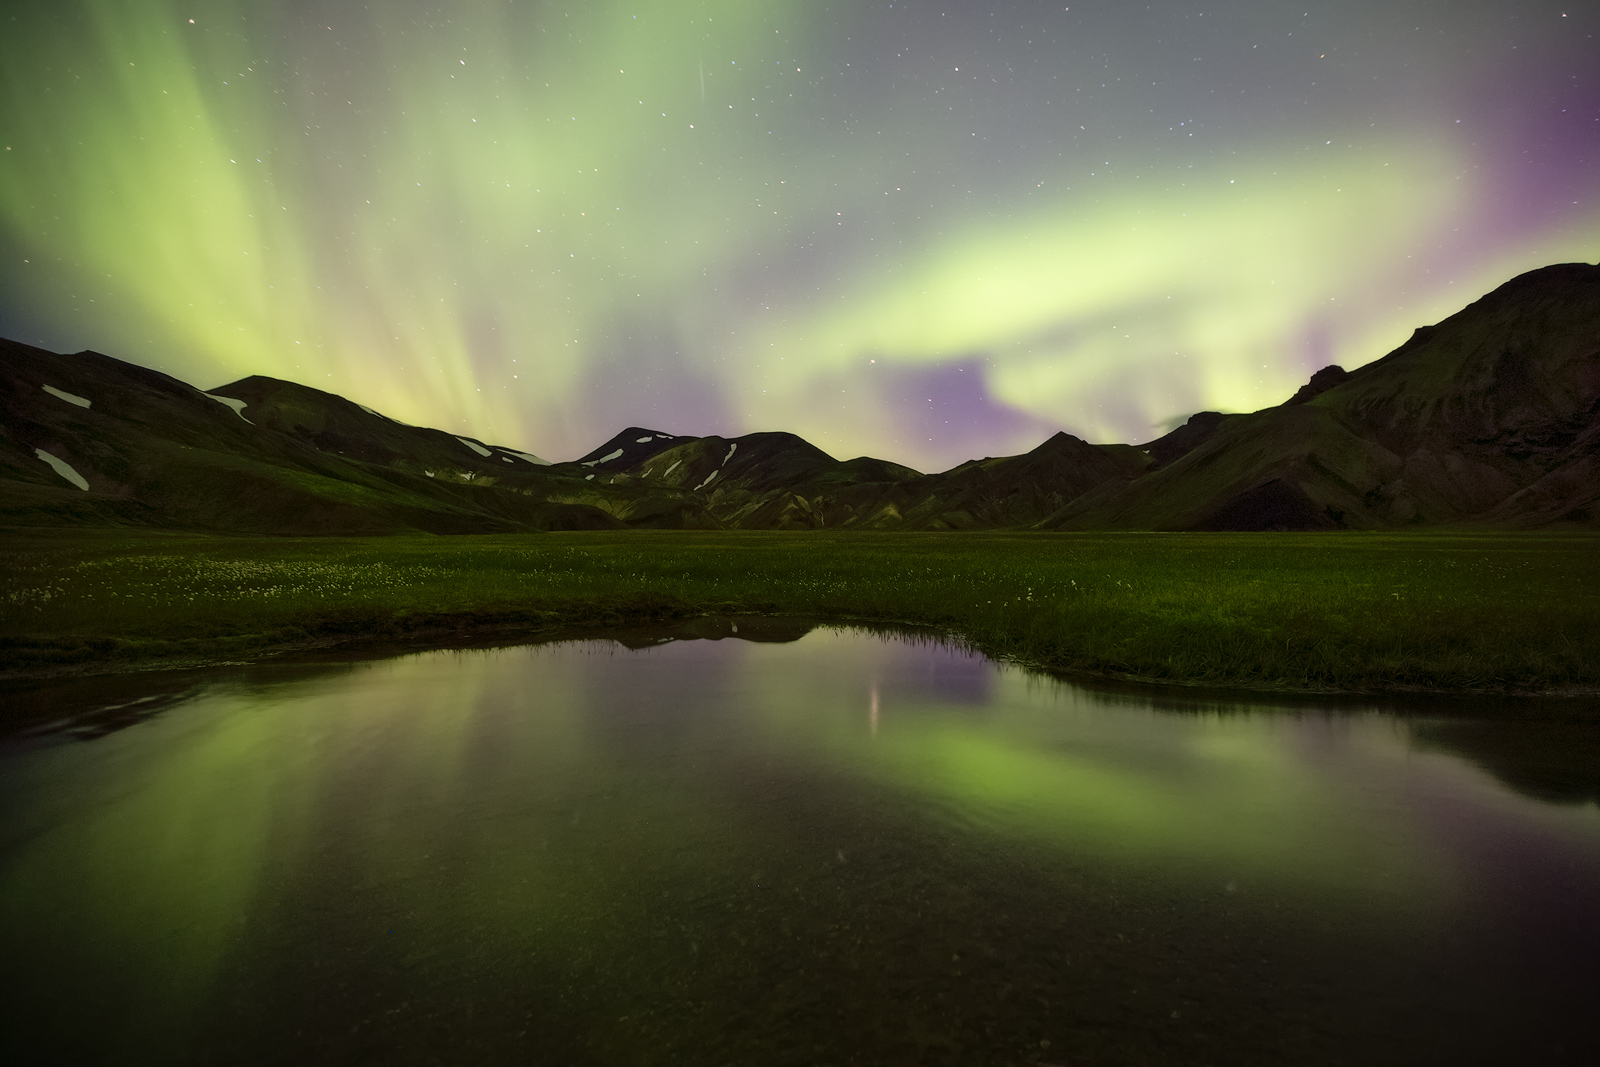 aurora,borealis,center,central,europe,hill,iceland,interior,landmannalaugar,mountain,northern lights,the northern lights,volcano, photo